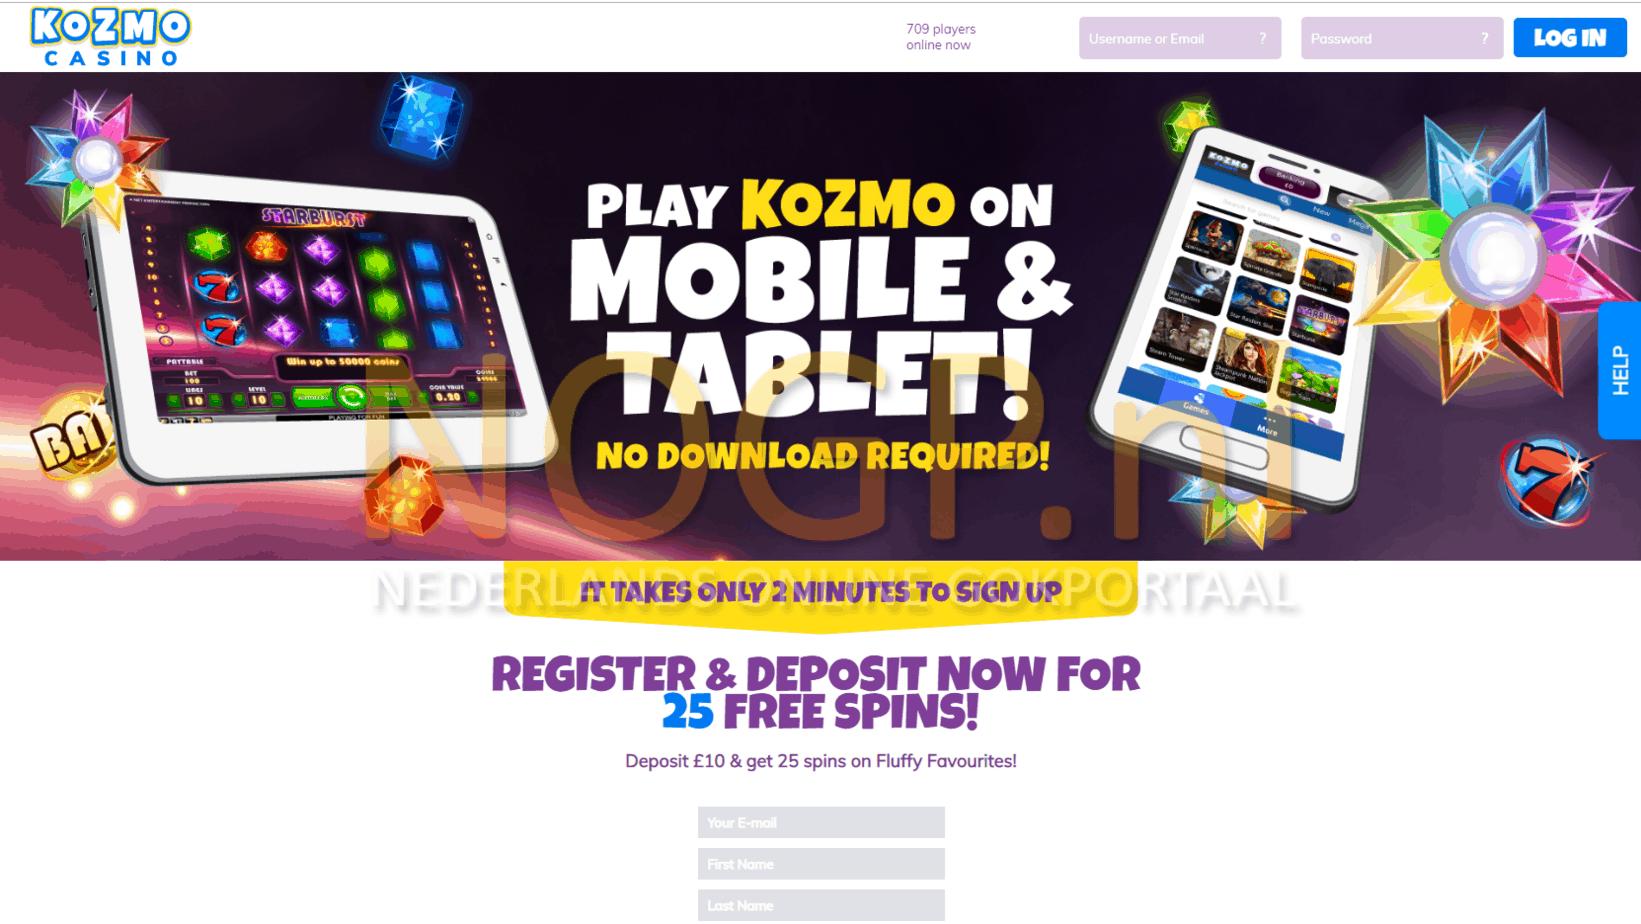 Kozmo Casino homepage screenshot